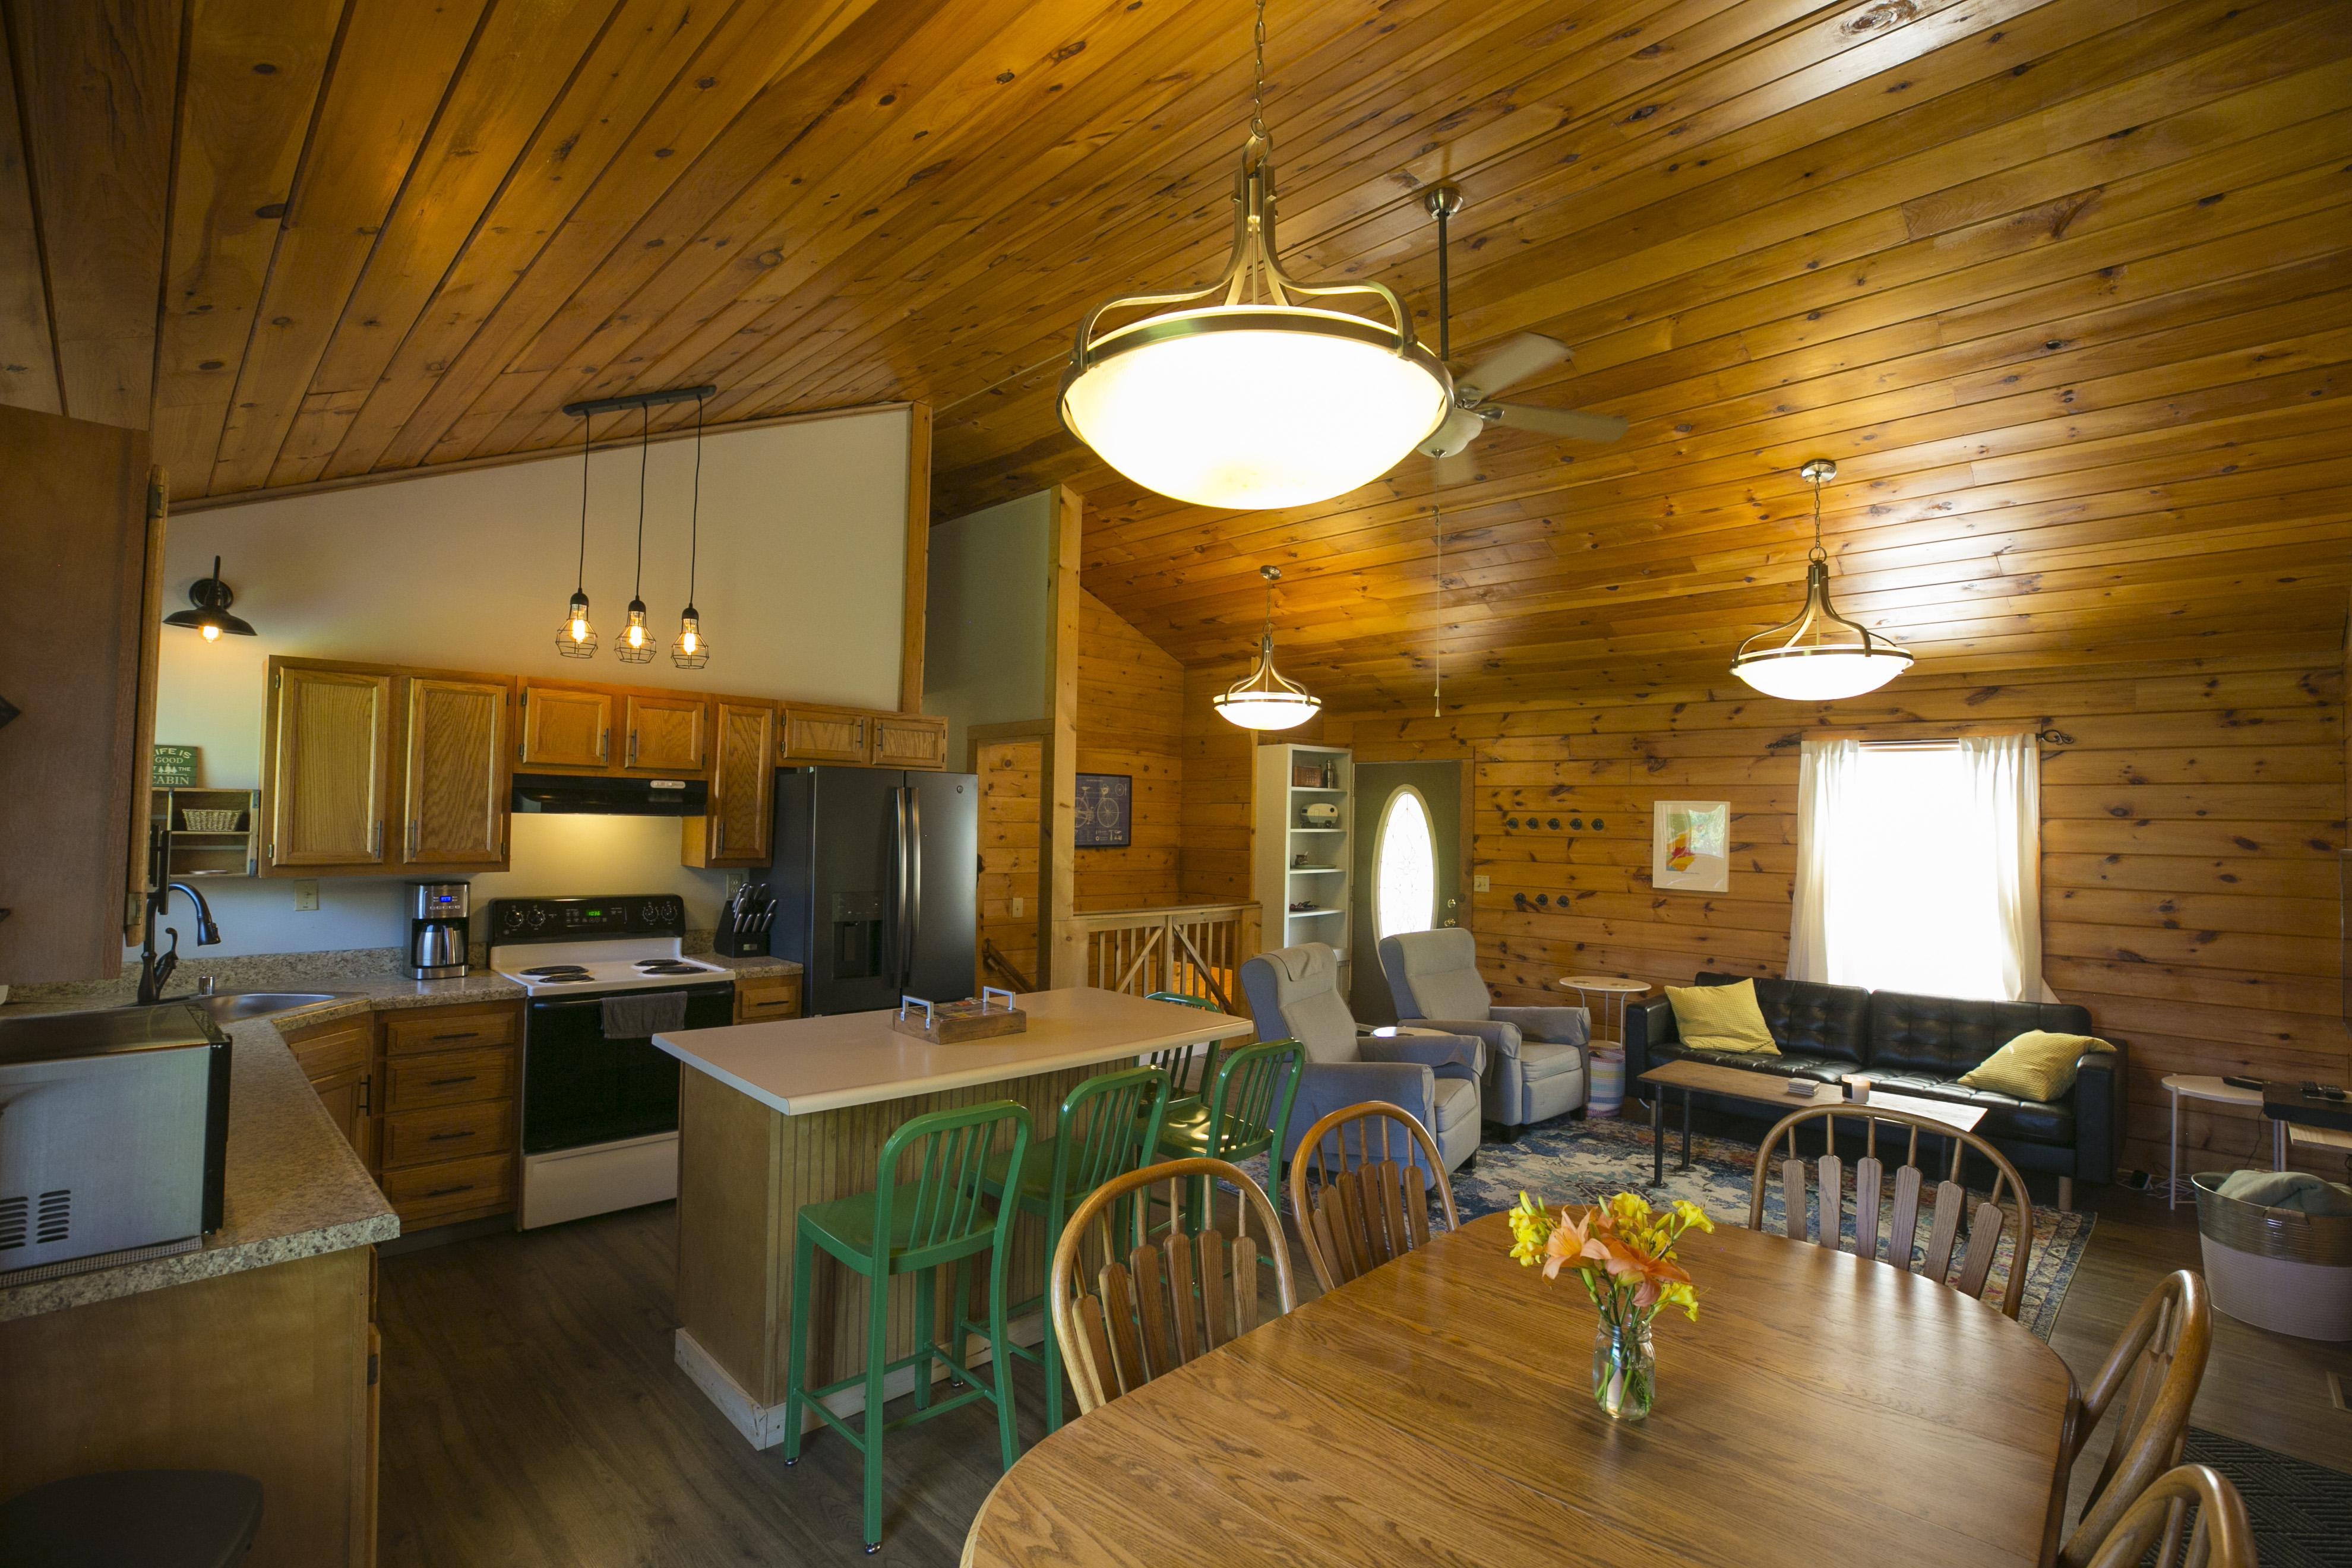 Woodpointe Scenic Cabin Rentals